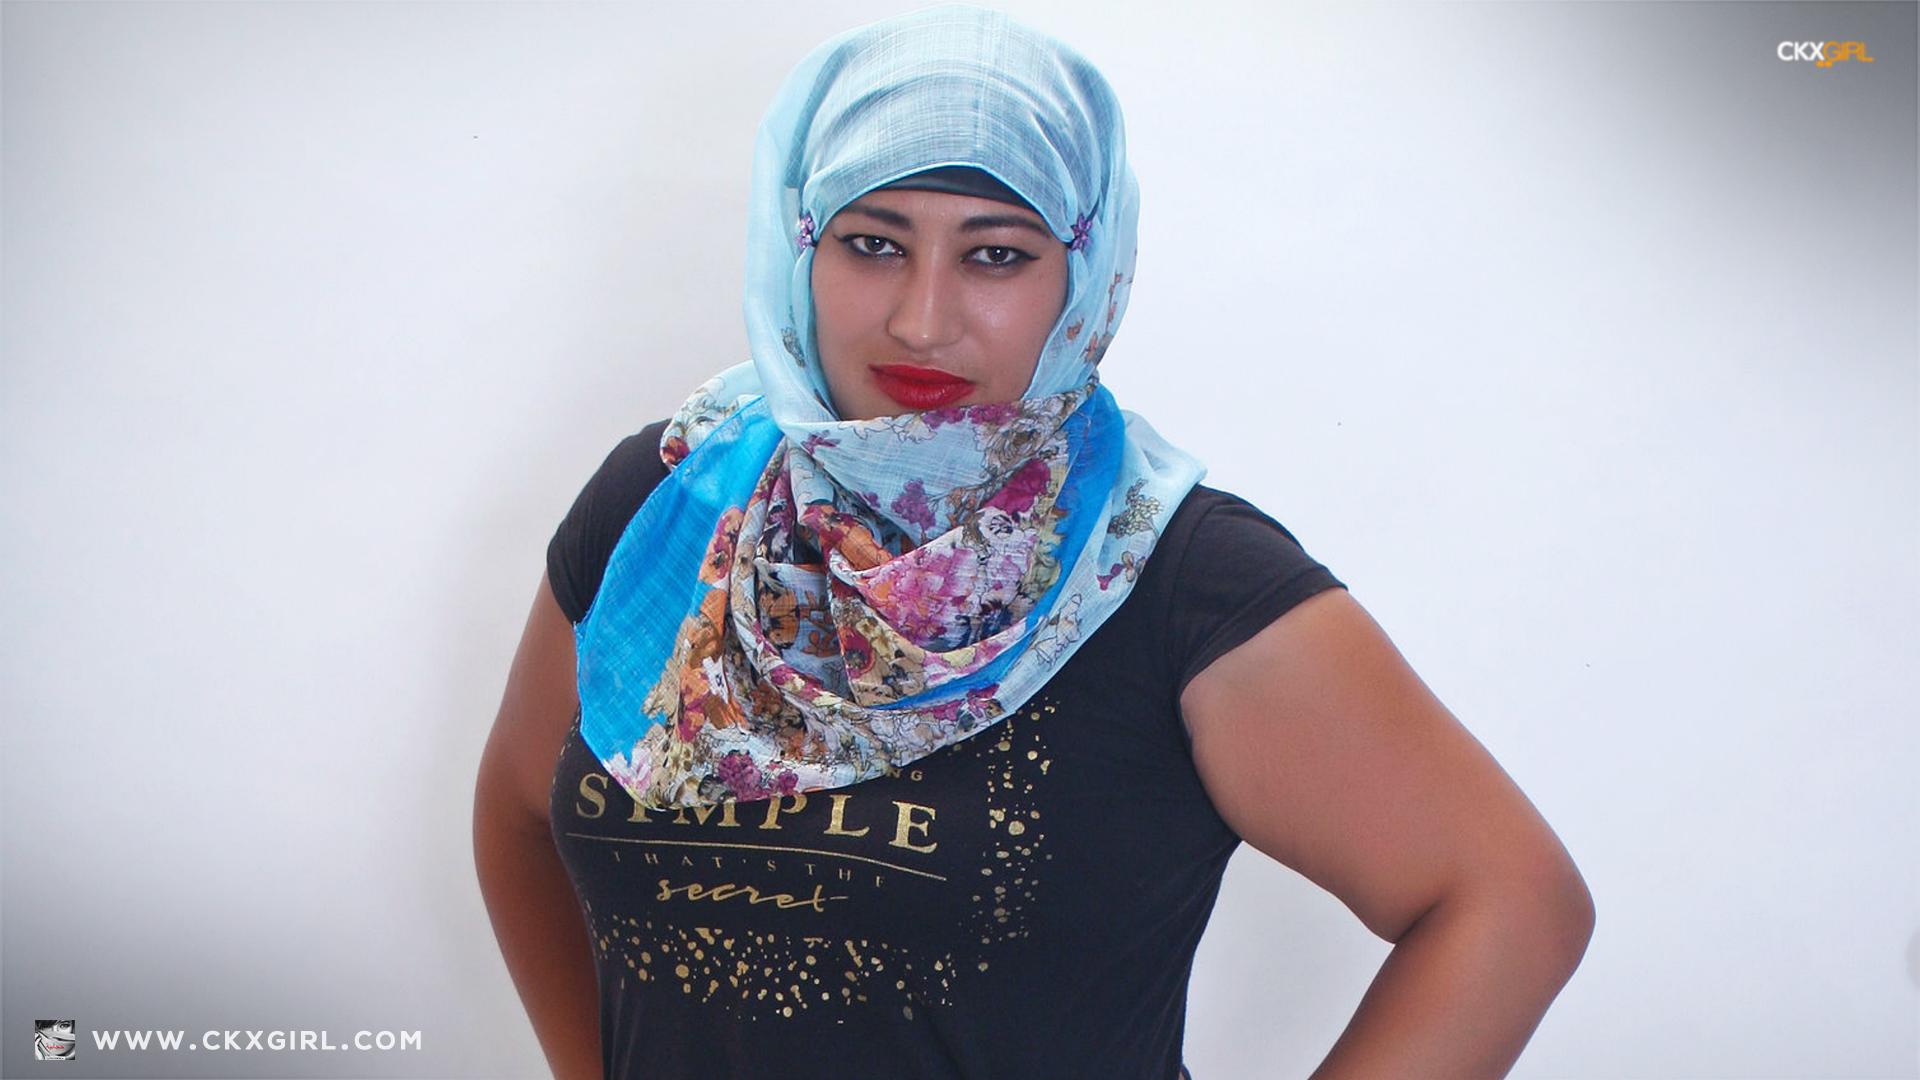 👩🏻 NEW Muslim Girl ▶ LatifaMuslimy ✔︎